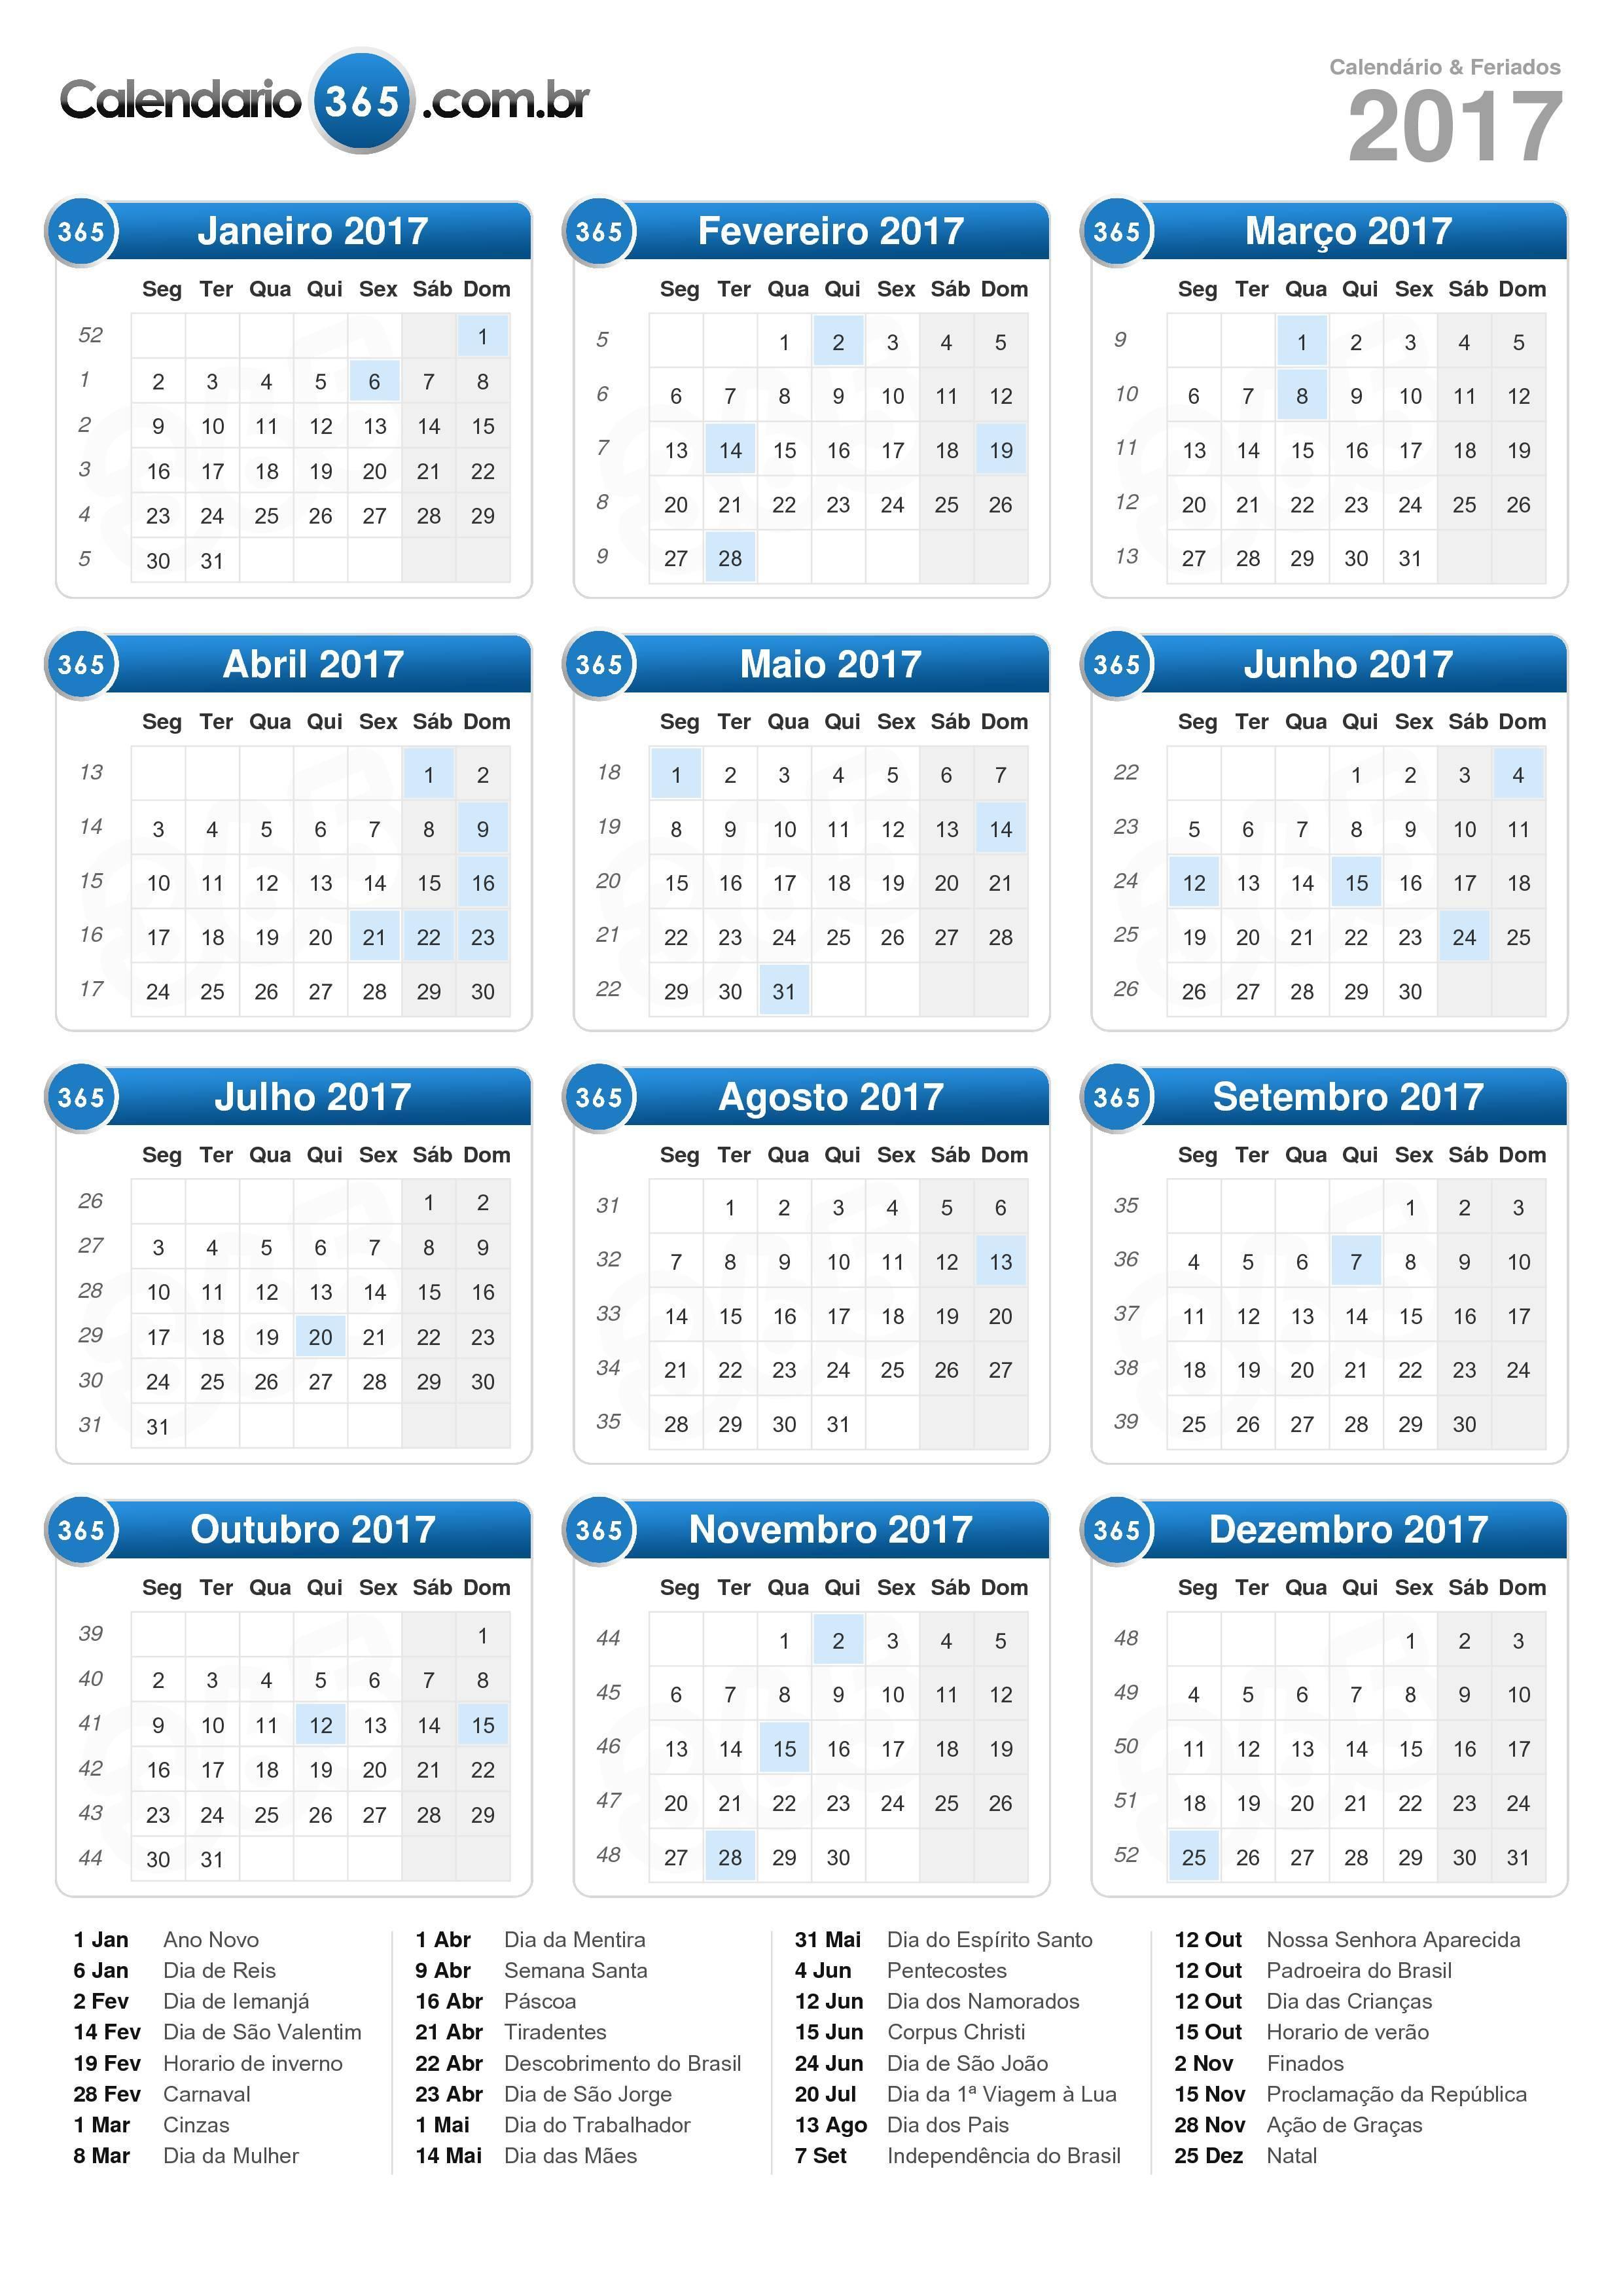 Nz Calendar Year Vs Fiscal Year Momentjs Docs Calend225;rio 2017